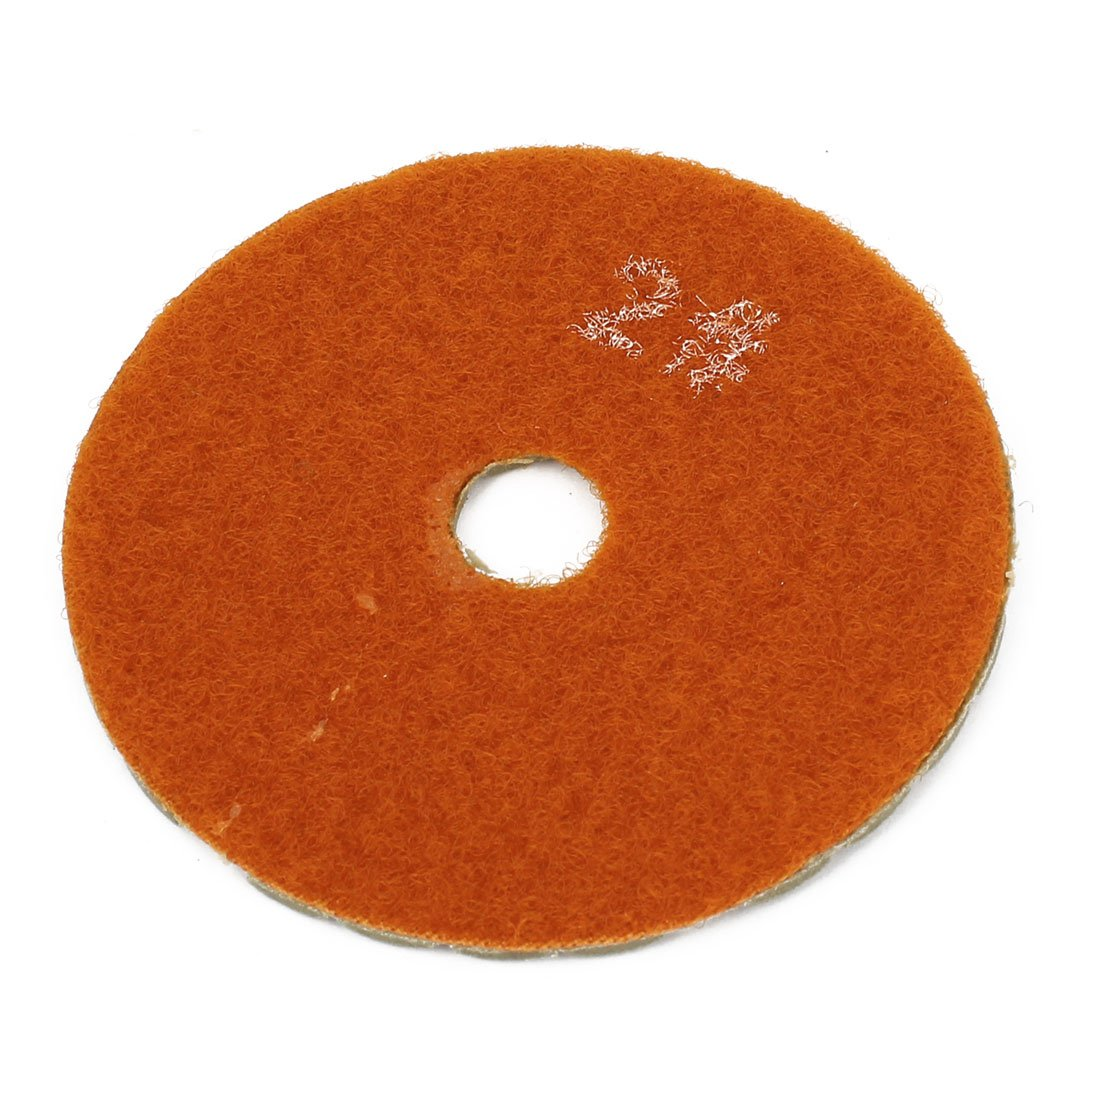 Khaki Orange Dragonmarts Co 3-Inch Uxcell Grinding Diamond Grit 150 Dry Polishing Pad // Uxcell a14062300ux0550 Ltd